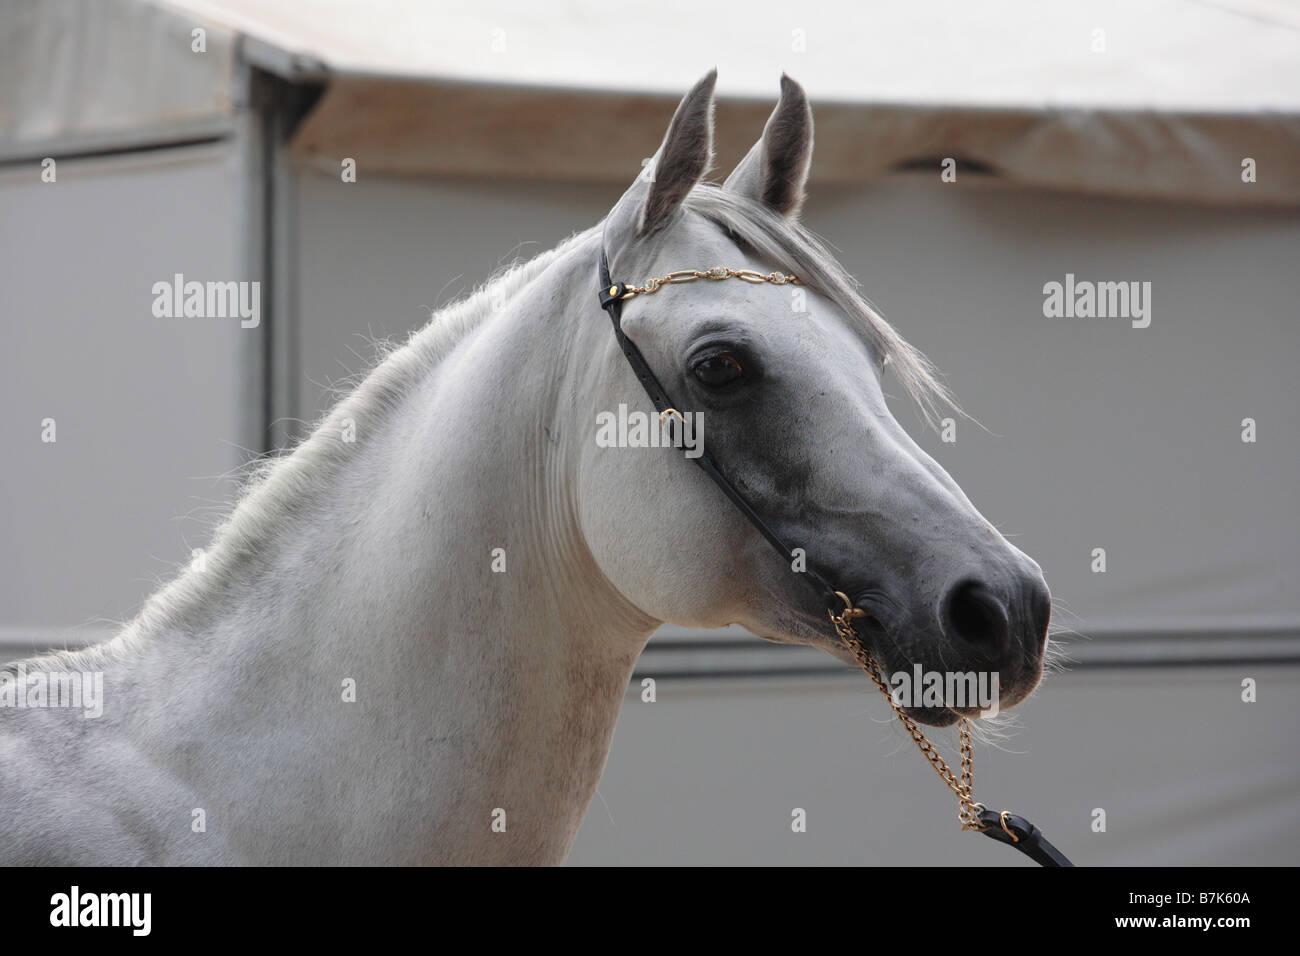 White Arabian Horse Portrait Stock Photo Alamy